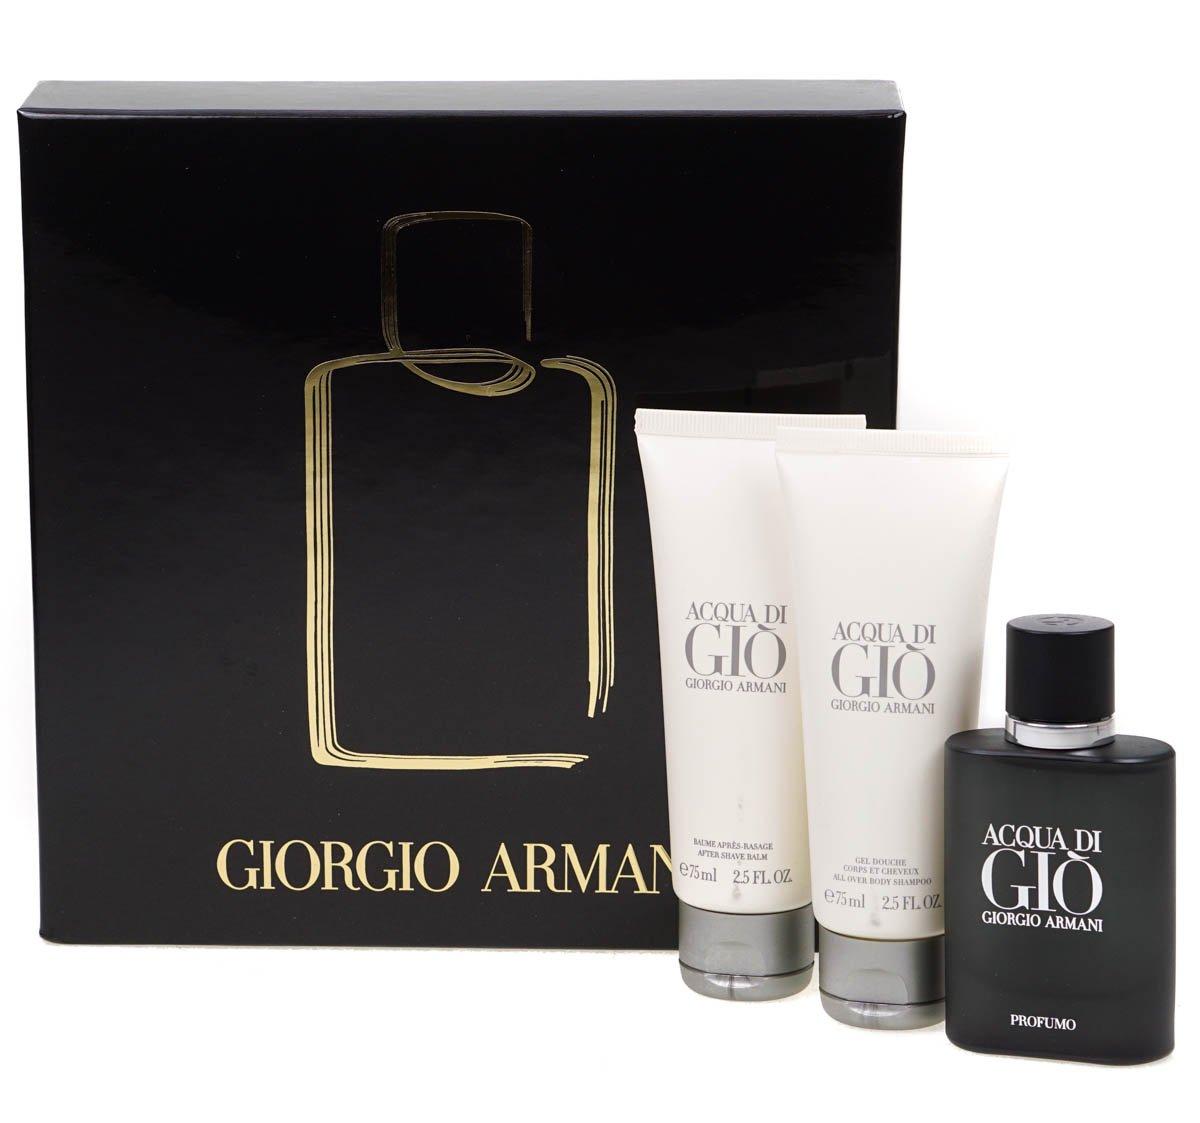 Acqua Di Gio Profumo by Giorgio Armani Eau de Parfum Spray 40ml, Shower Gel 75ml & Aftershave Balm 75ml R-50-040-03